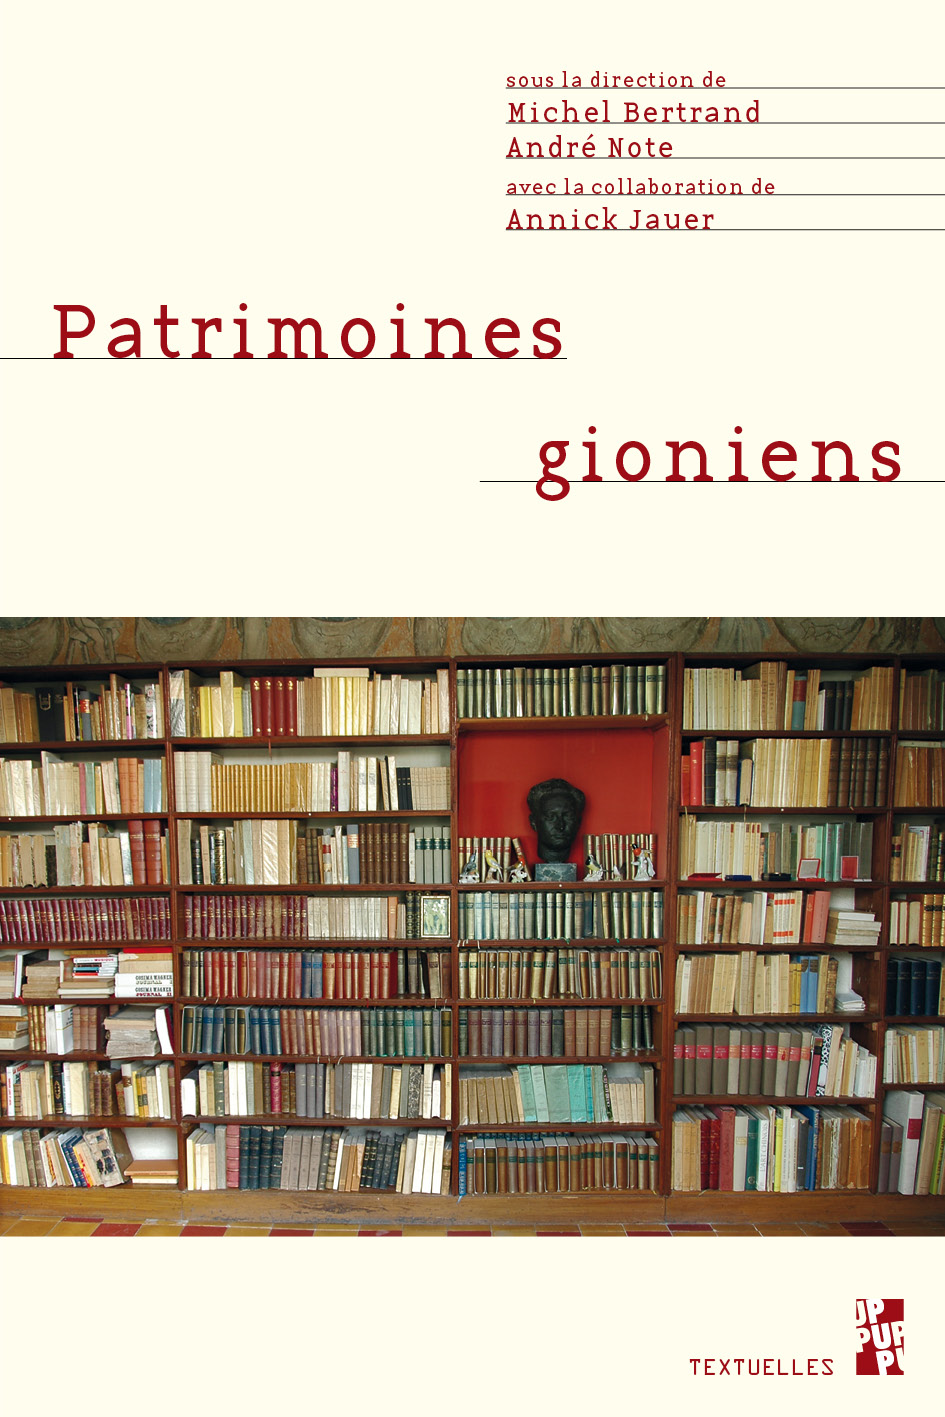 M. Bertrand & A. Note (dir.), Patrimoines gioniens